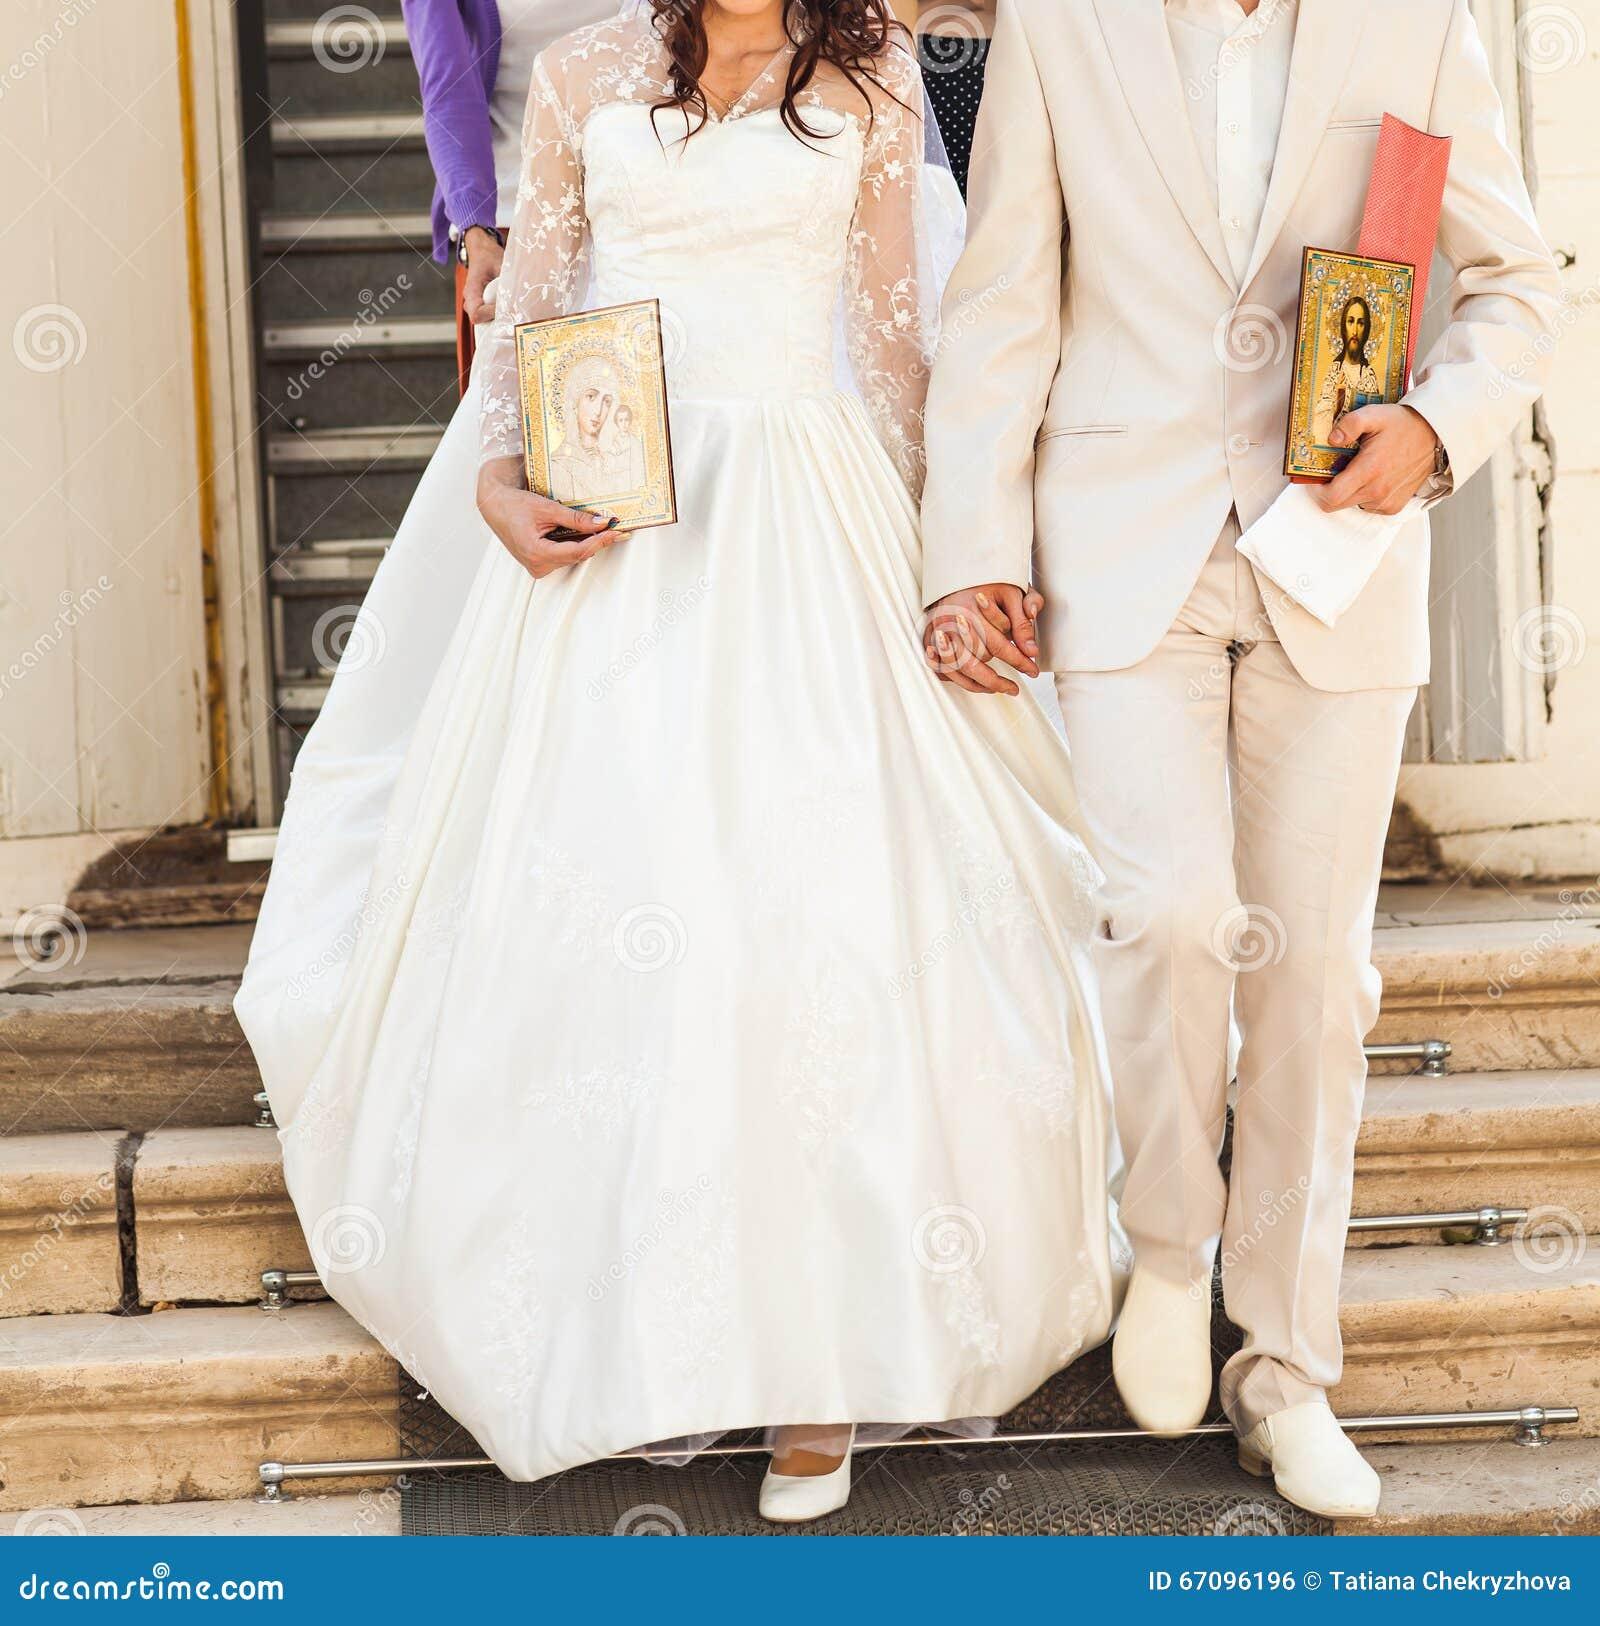 Jewish Wedding Altar: Bride And Groom After Orthodox Wedding Ceremony Stock